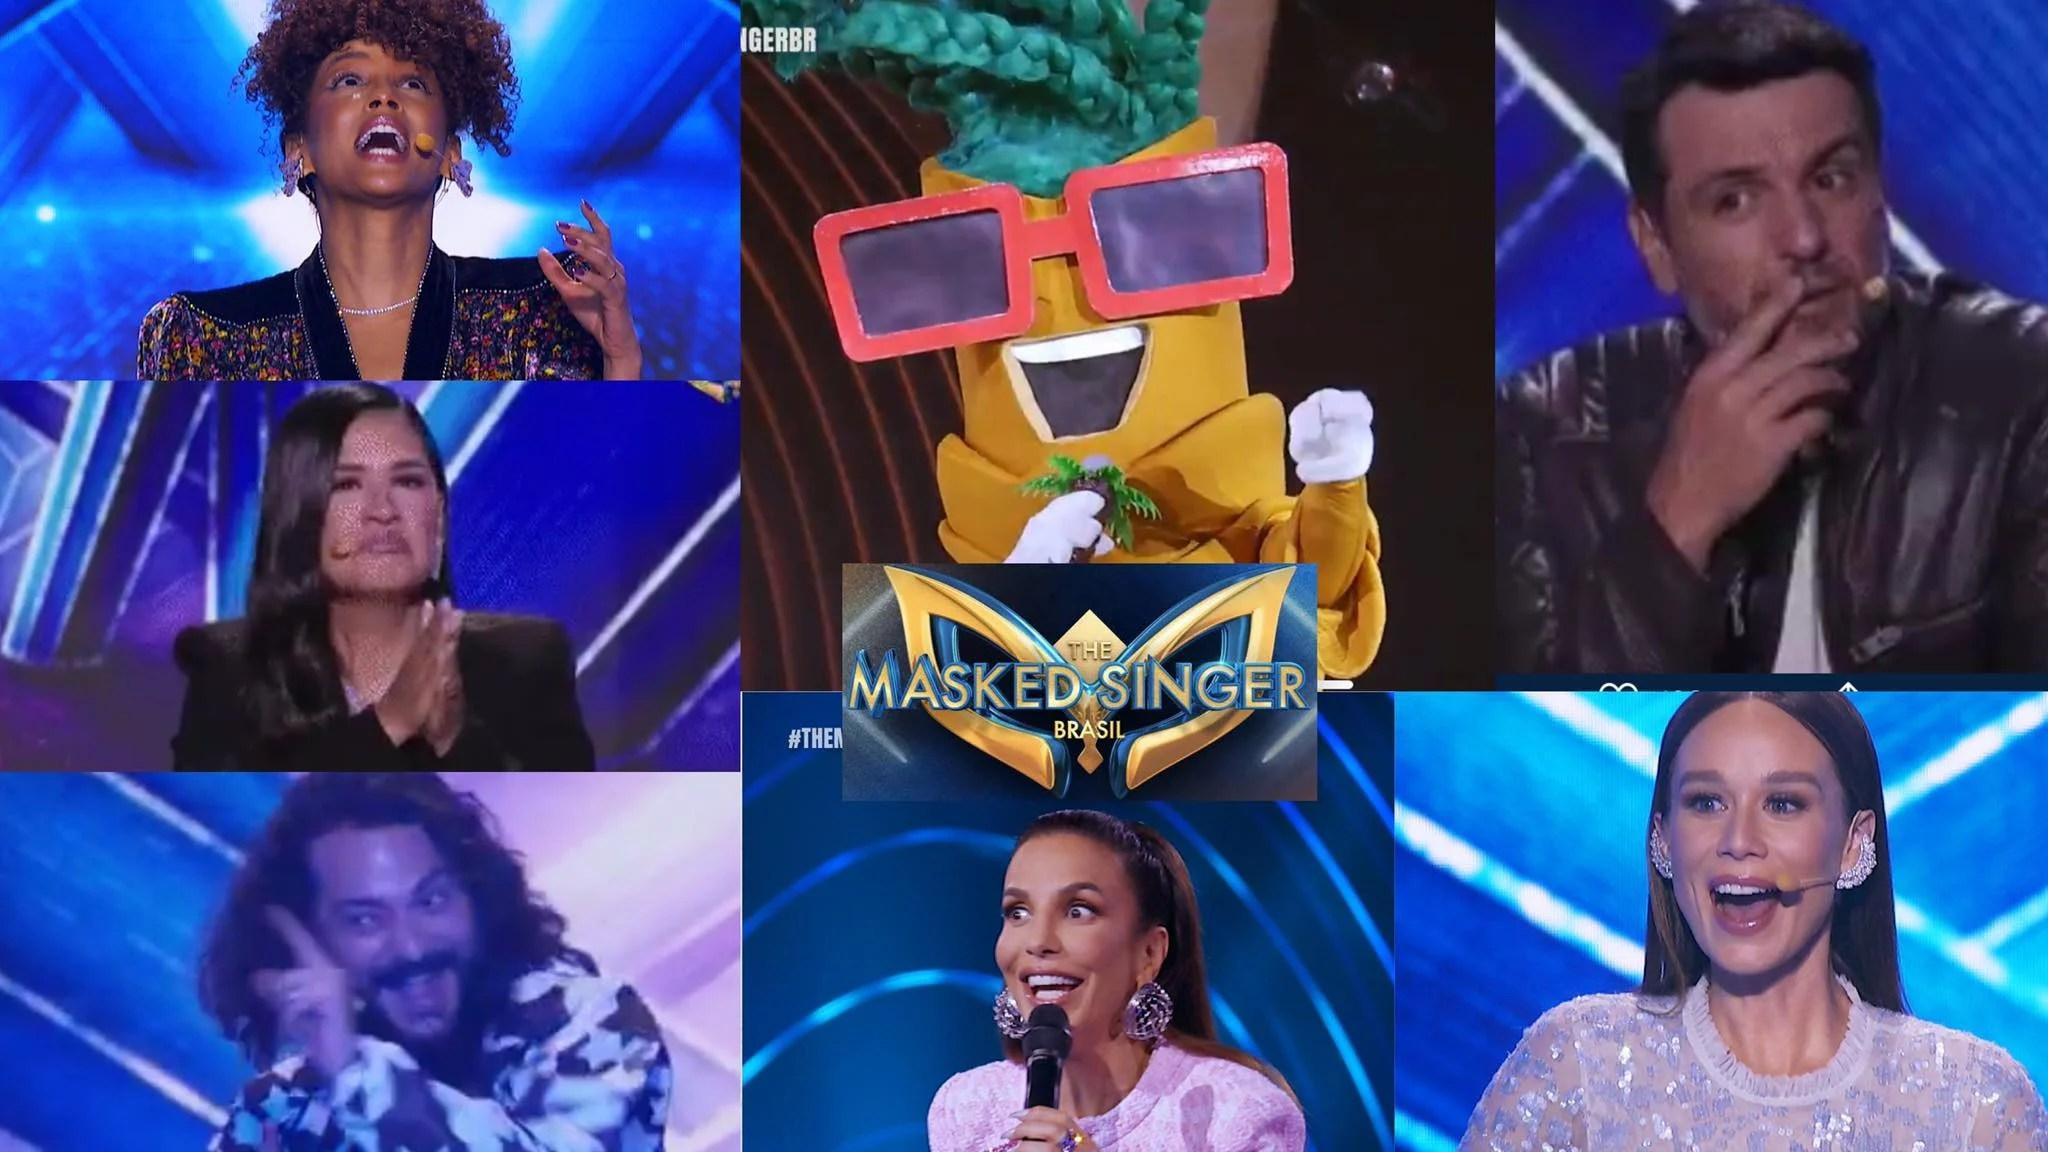 Identidade do Coqueiro surpreende a todos no The Masked Singer Brasil. Fonte: Montagem/Fashion Bubbles